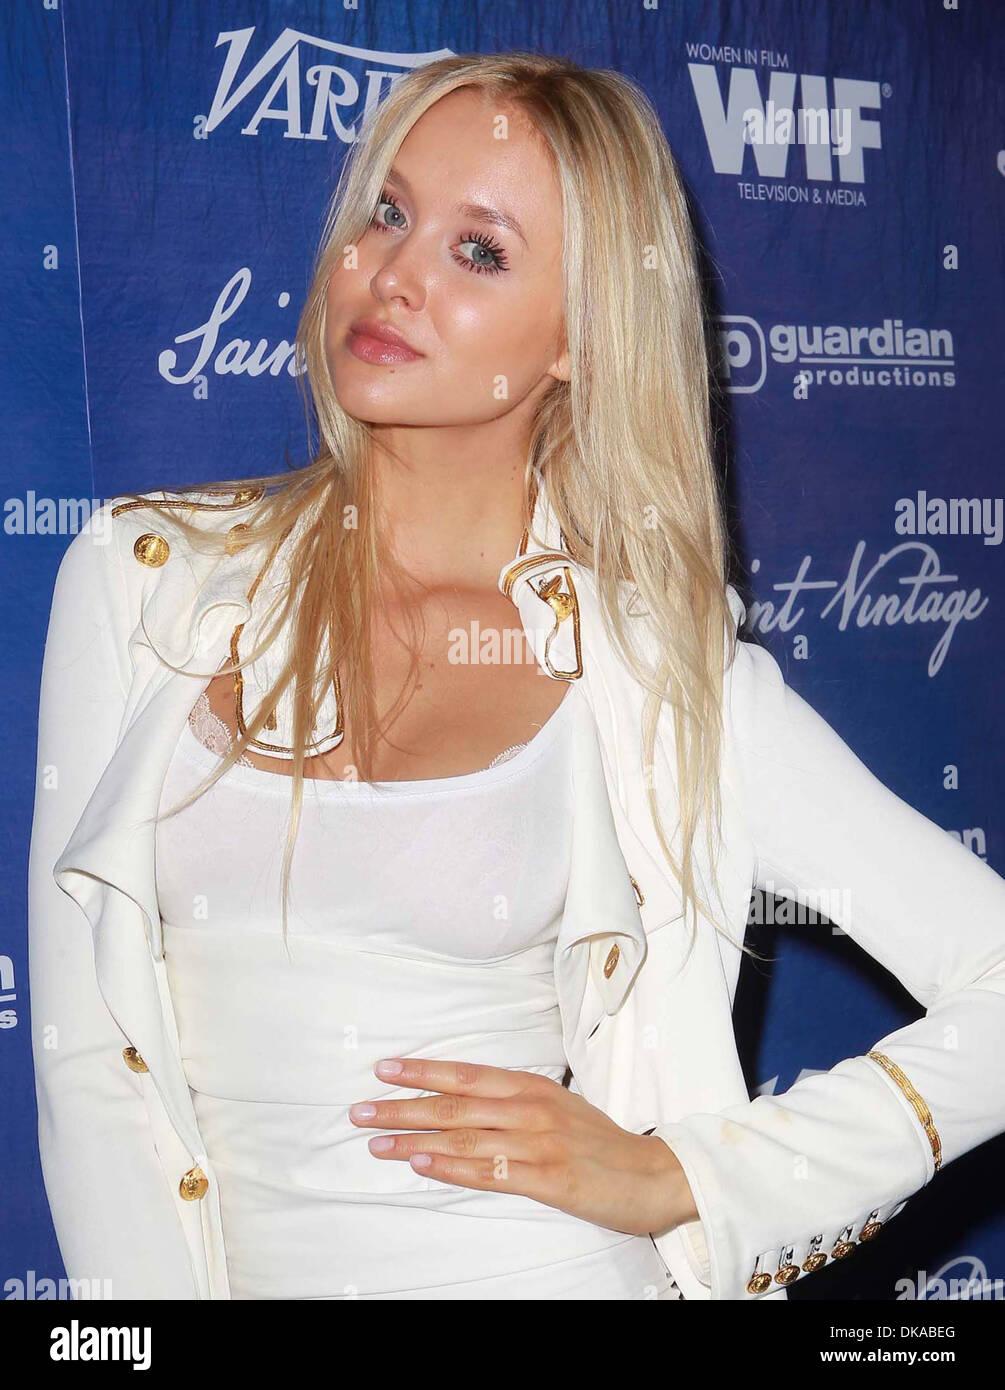 Amalie Wichmann Hot amalie film stock photos & amalie film stock images - alamy